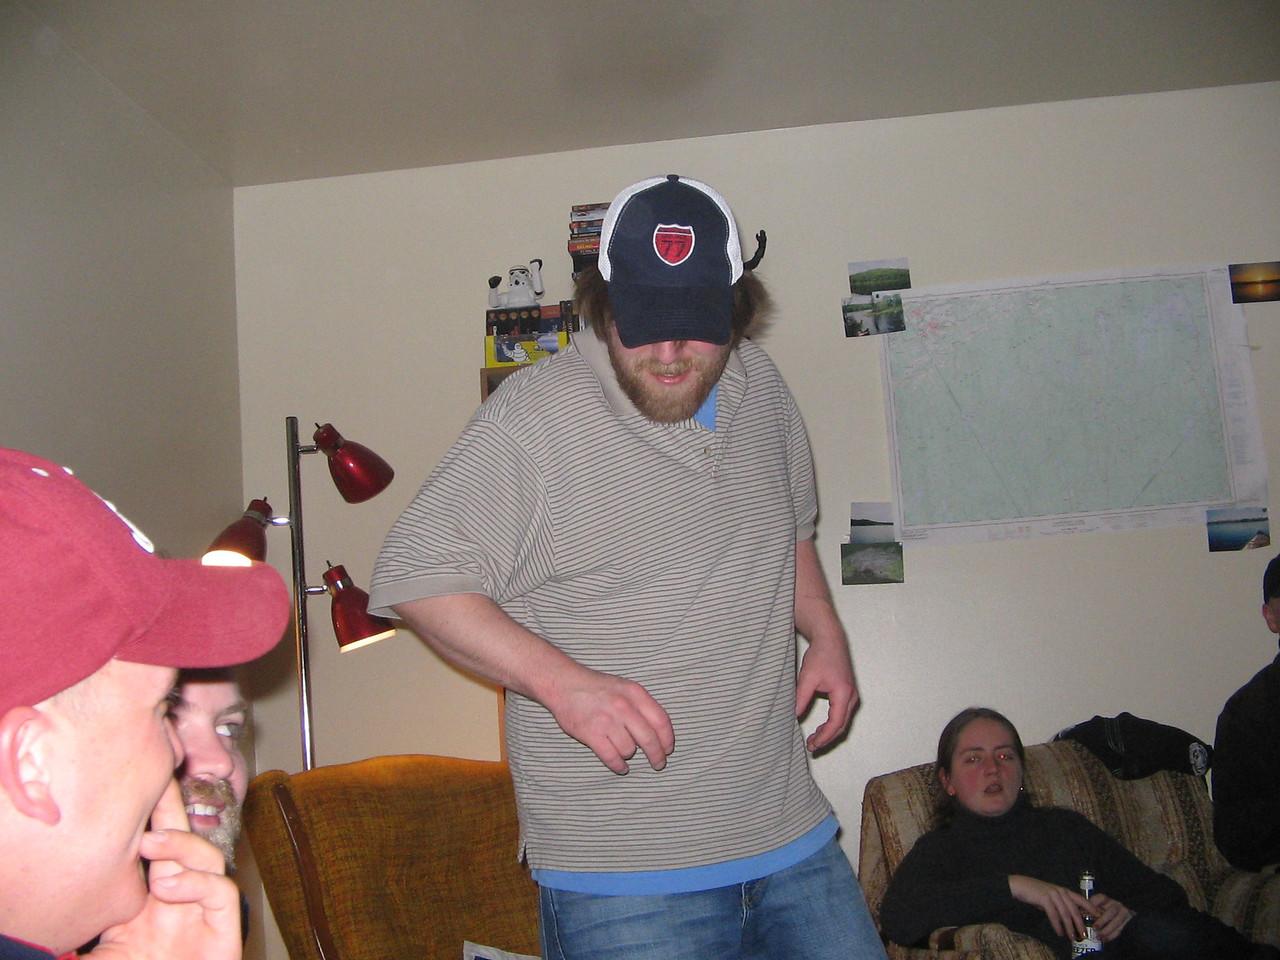 Matt Kennedy dancing at Big Trev's Place